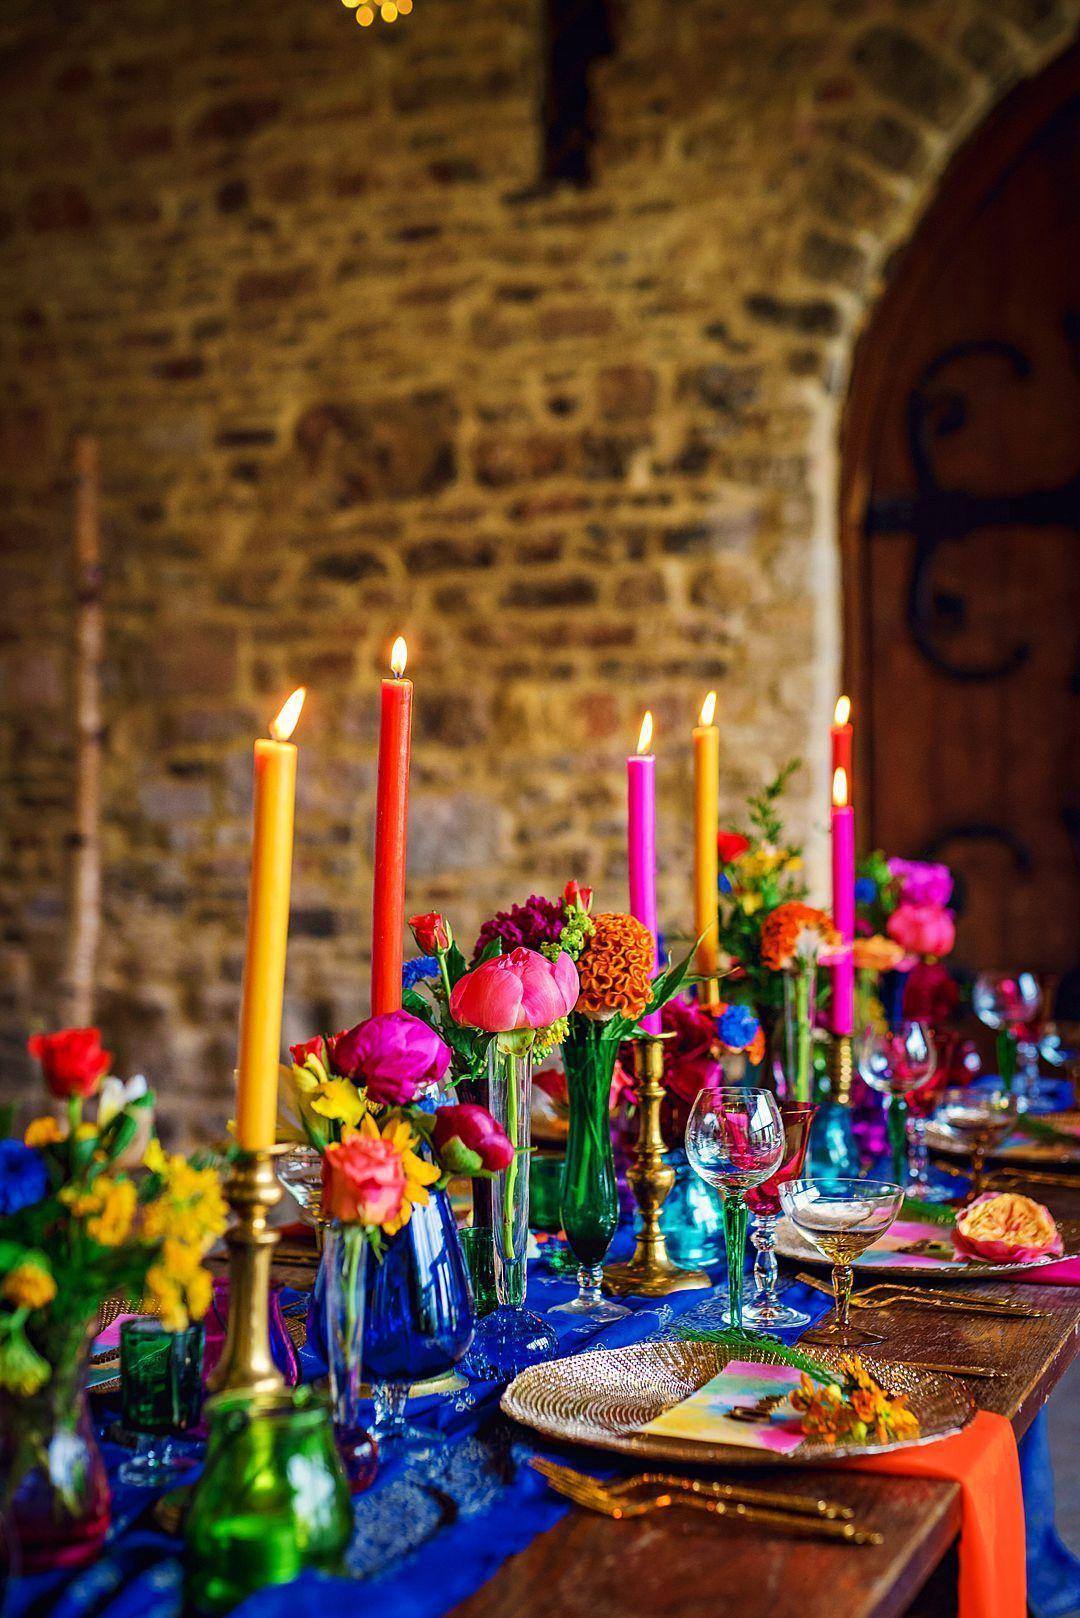 Festival Wedding Inspiration | A Bright and Colourful Bridal Shoot | Festival Brides -  FESTIVAL BRIDES | Festival Wedding Inspiration | A Bright and Colourful Bridal Shoot  - #Bridal #brides #BridesmaidDresses #bright #colourful #DiyWedding #EngagementPhotos #EngagementRings #Festival #FloralArrangements #inspiration #LaceWeddingDresses #RomanticWeddings #shoot #wedding #WeddingAccessories #WeddingCakes #WeddingFavors #WeddingFlowers #WeddingHairstyles #Weddingideas #WeddingInvitations #Weddin